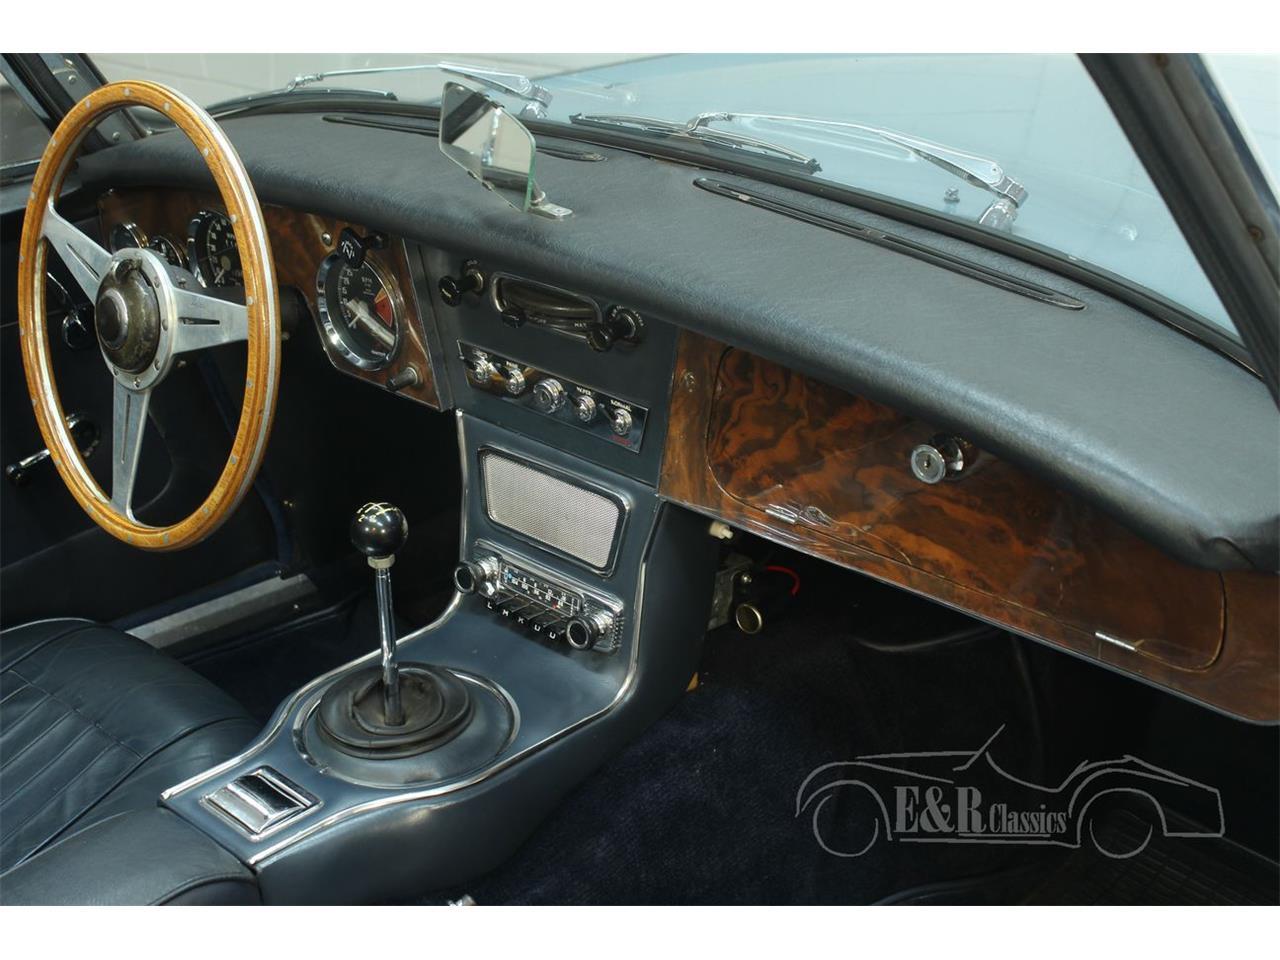 1967 Austin-Healey 3000 Mark III (CC-1248027) for sale in Waalwijk, noord brabant